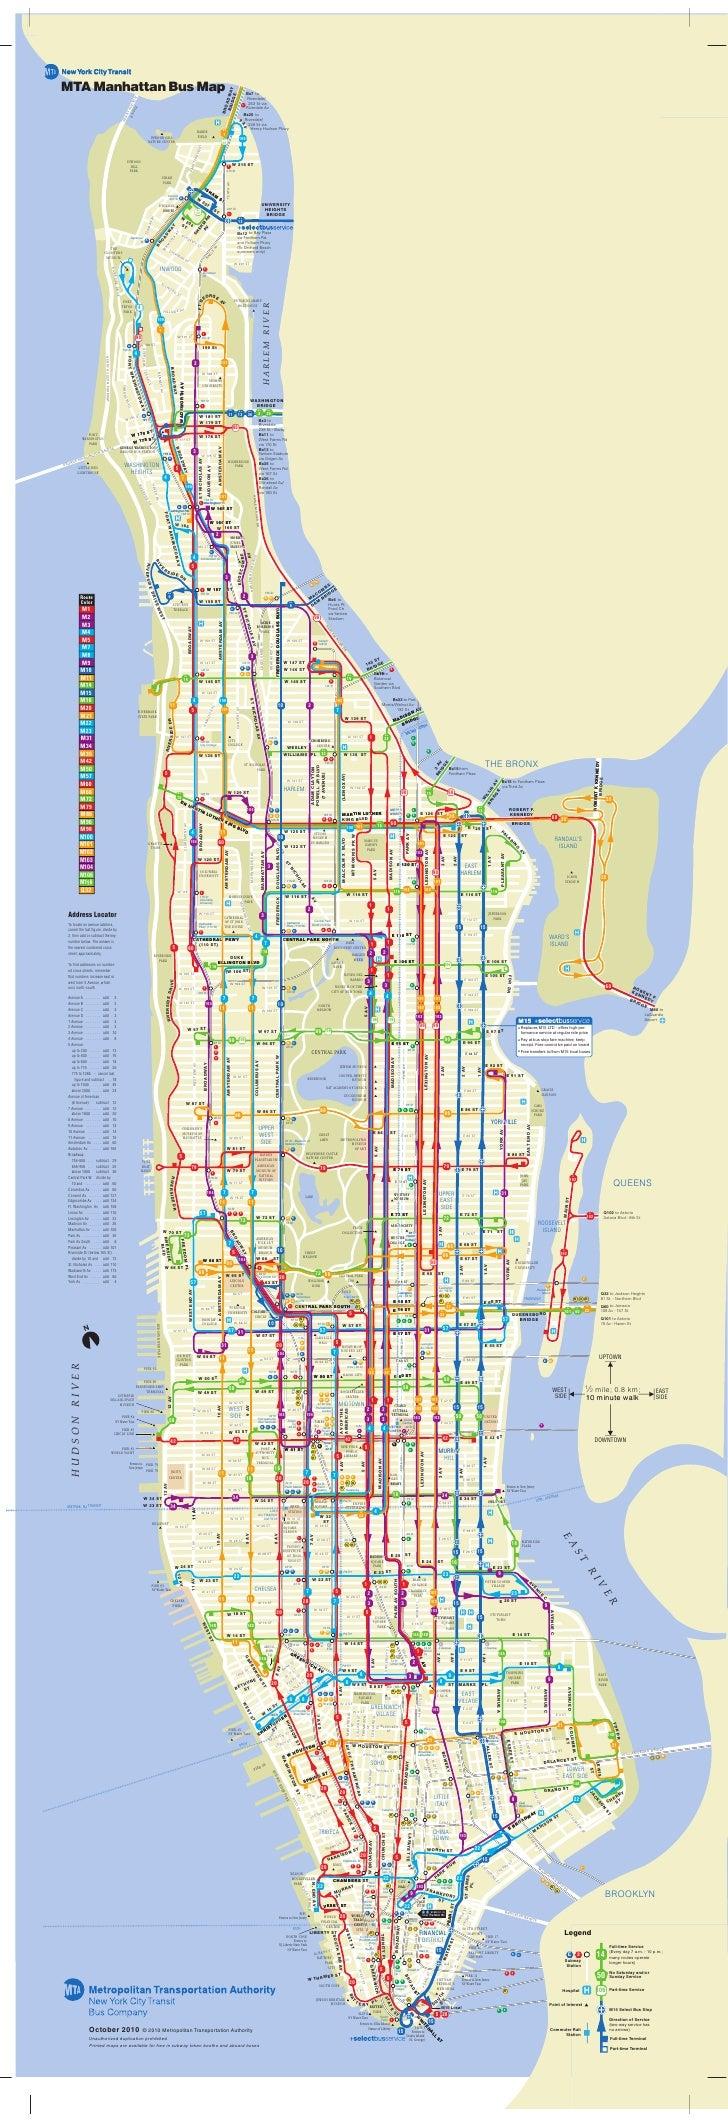 MTA Manhattan Bus Map                                                                                                     ...